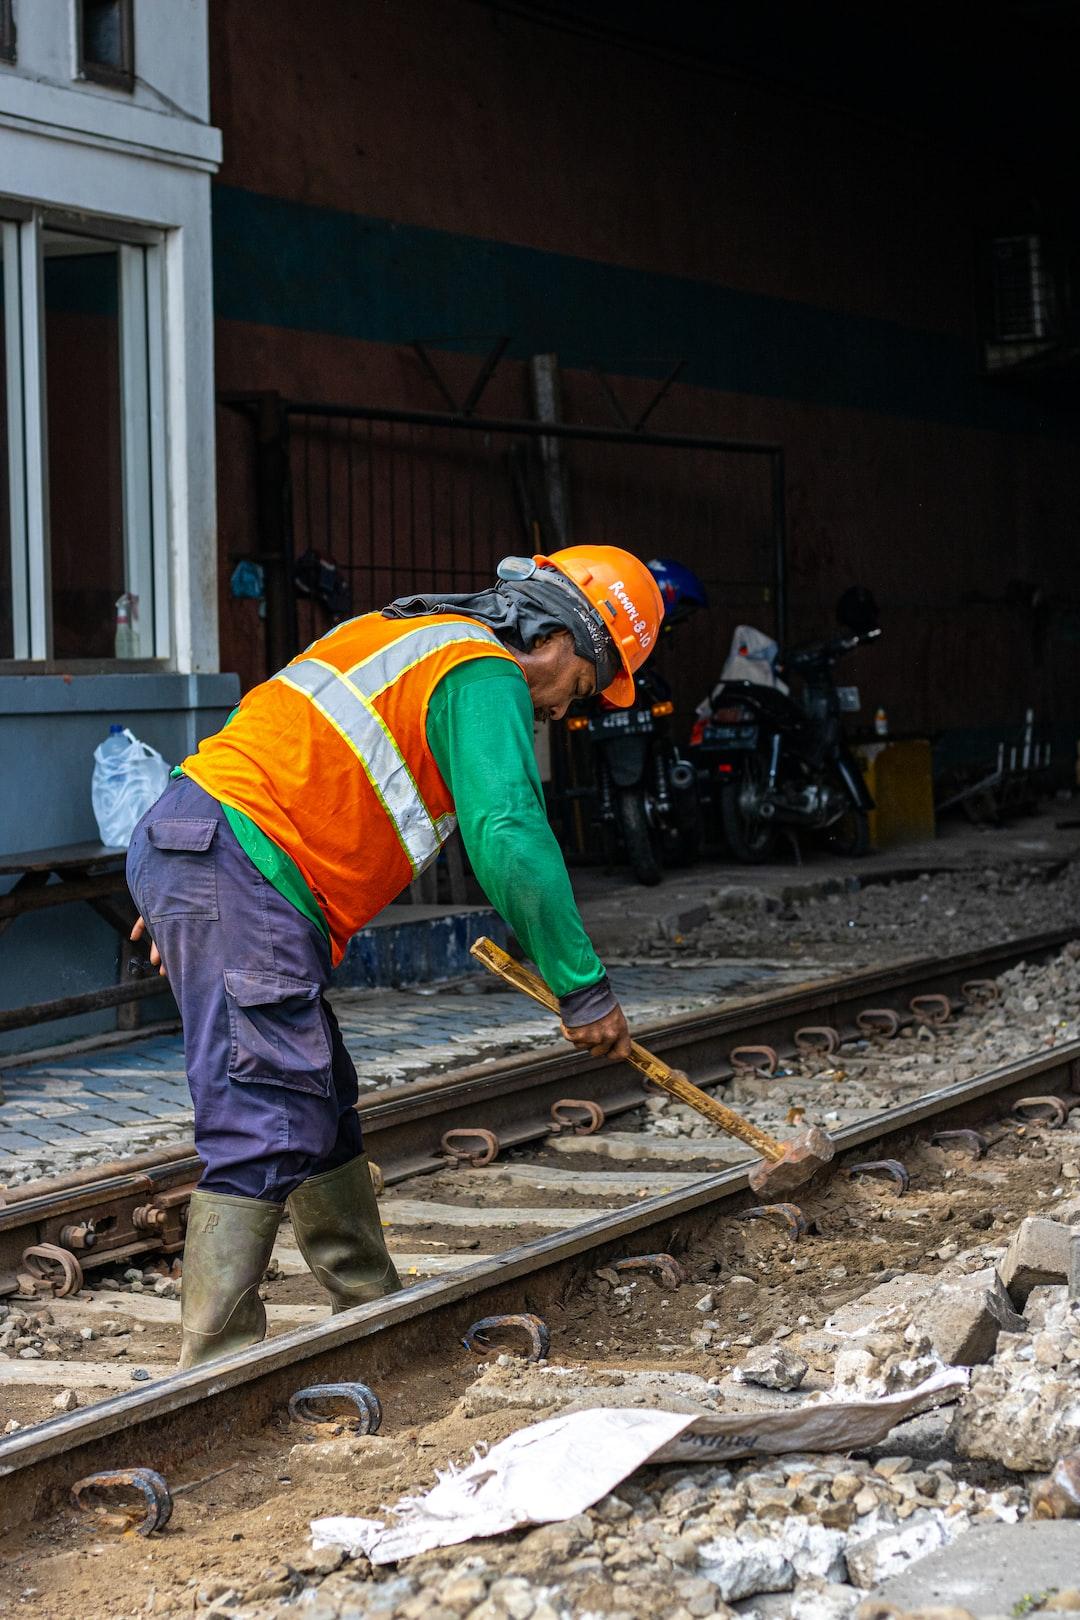 worker fixing a train road in jalan Dupak Surabaya Indonesia